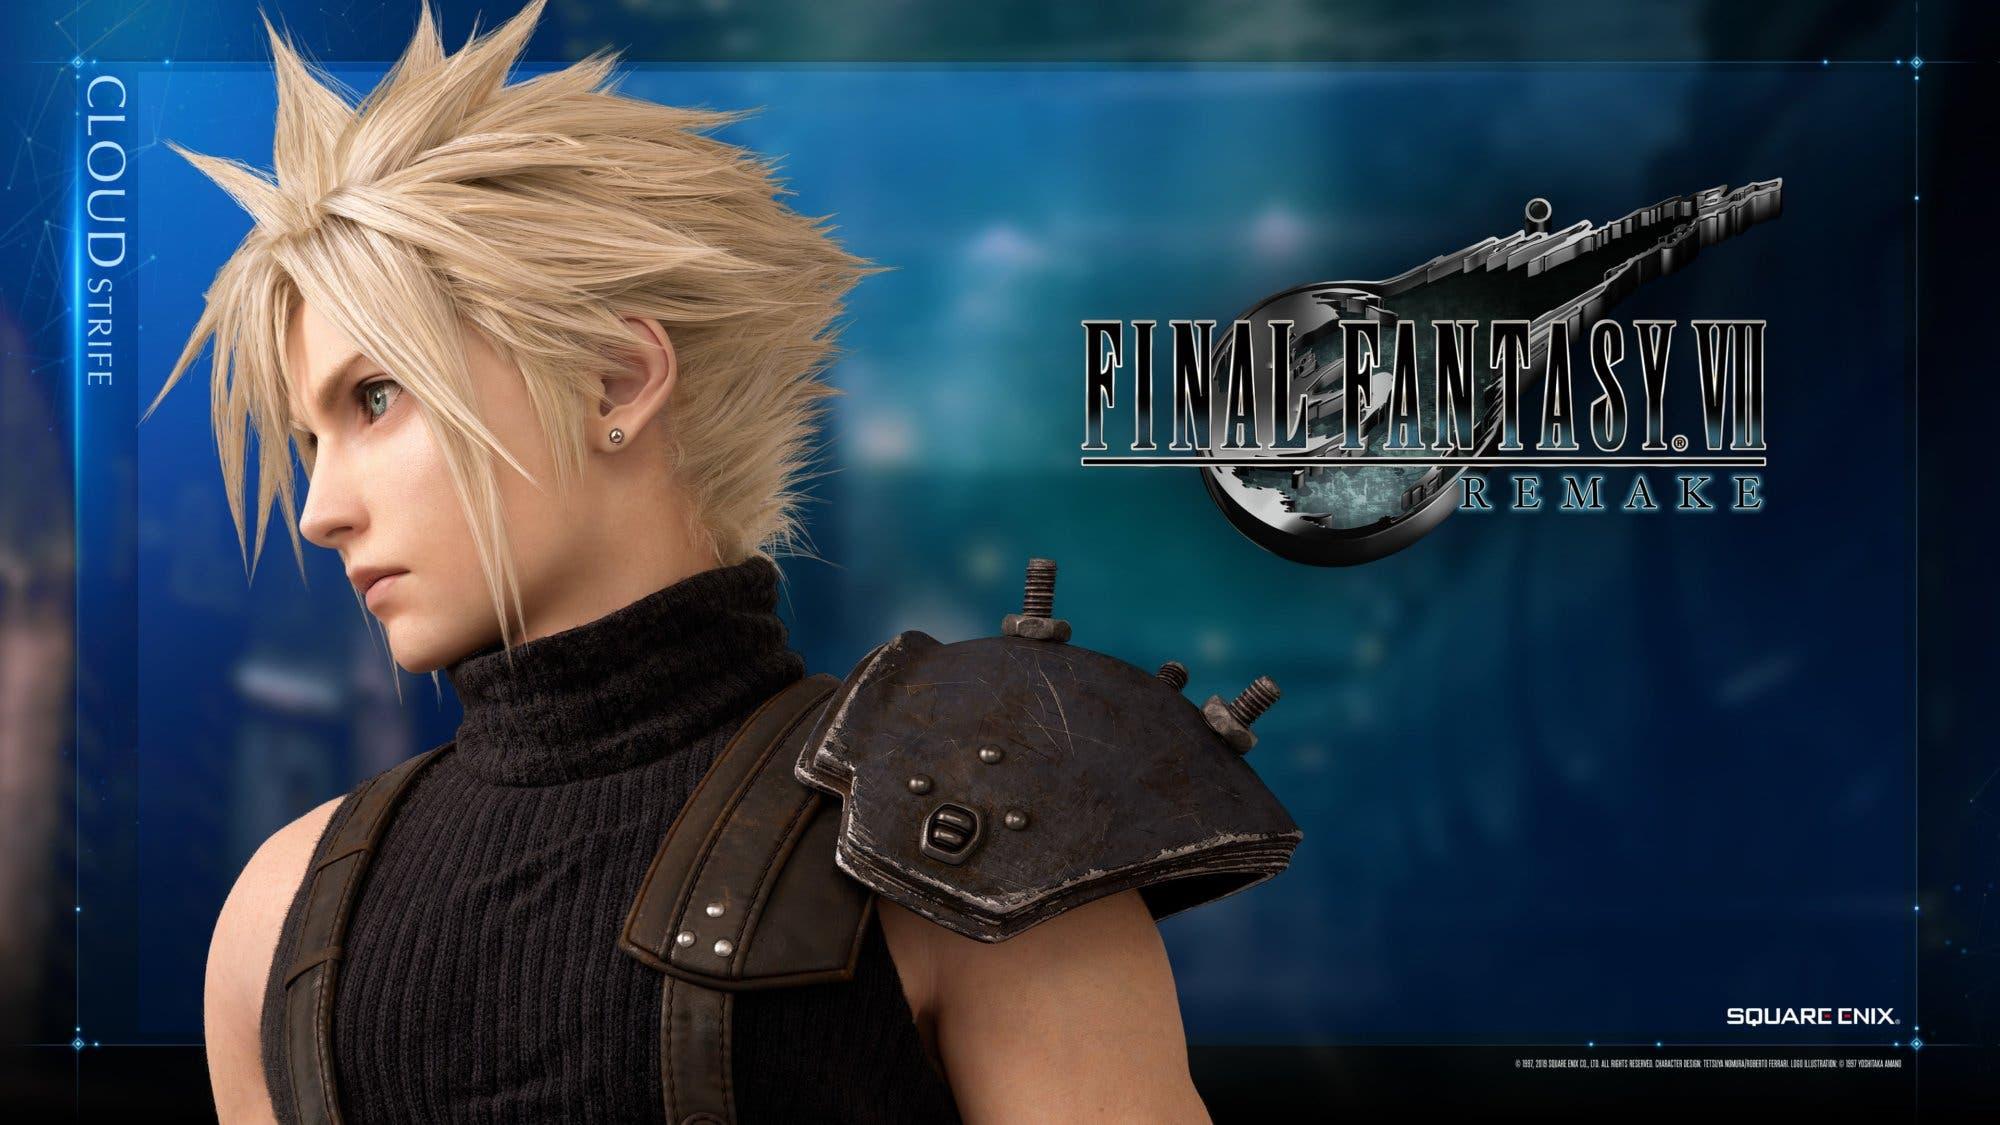 Final Fantasy Vii Remake Muestra Teaser Avatares Y Fondos